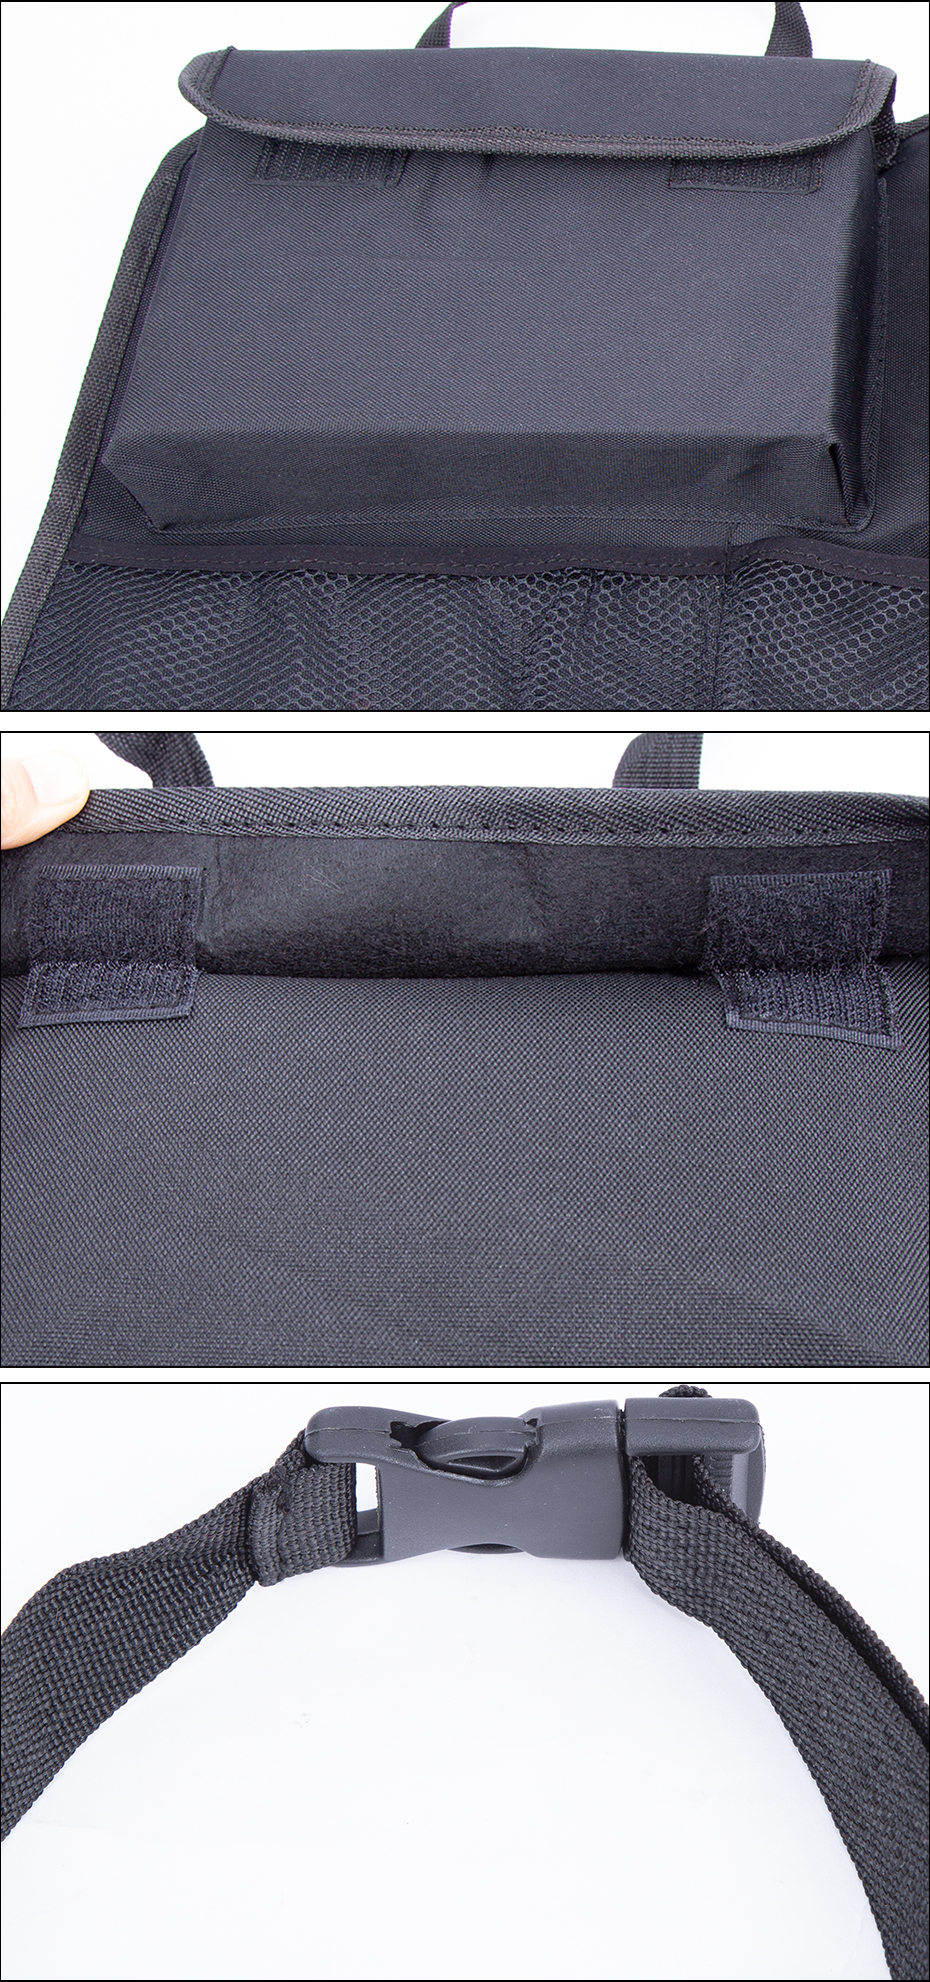 Car-Trunk-Organizer-Bag-01.detail_03